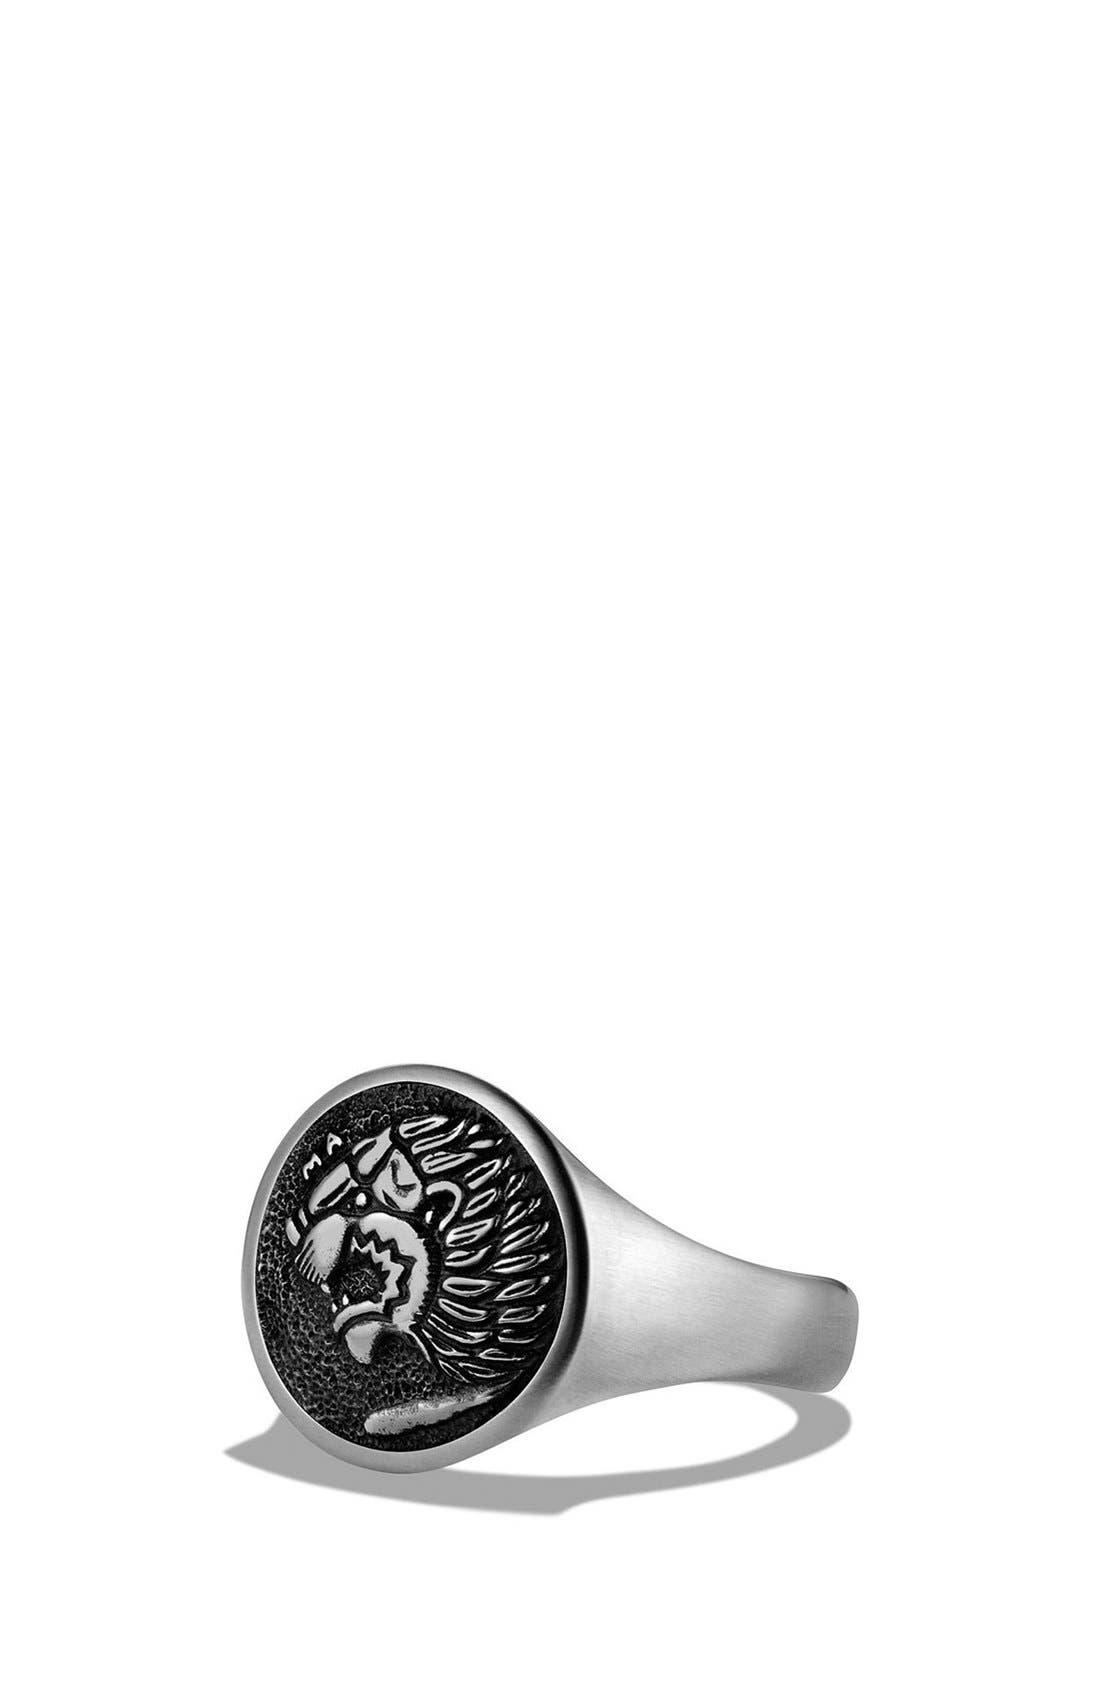 Alternate Image 1 Selected - David Yurman 'Petrvs' Lion Signet Pinky Ring